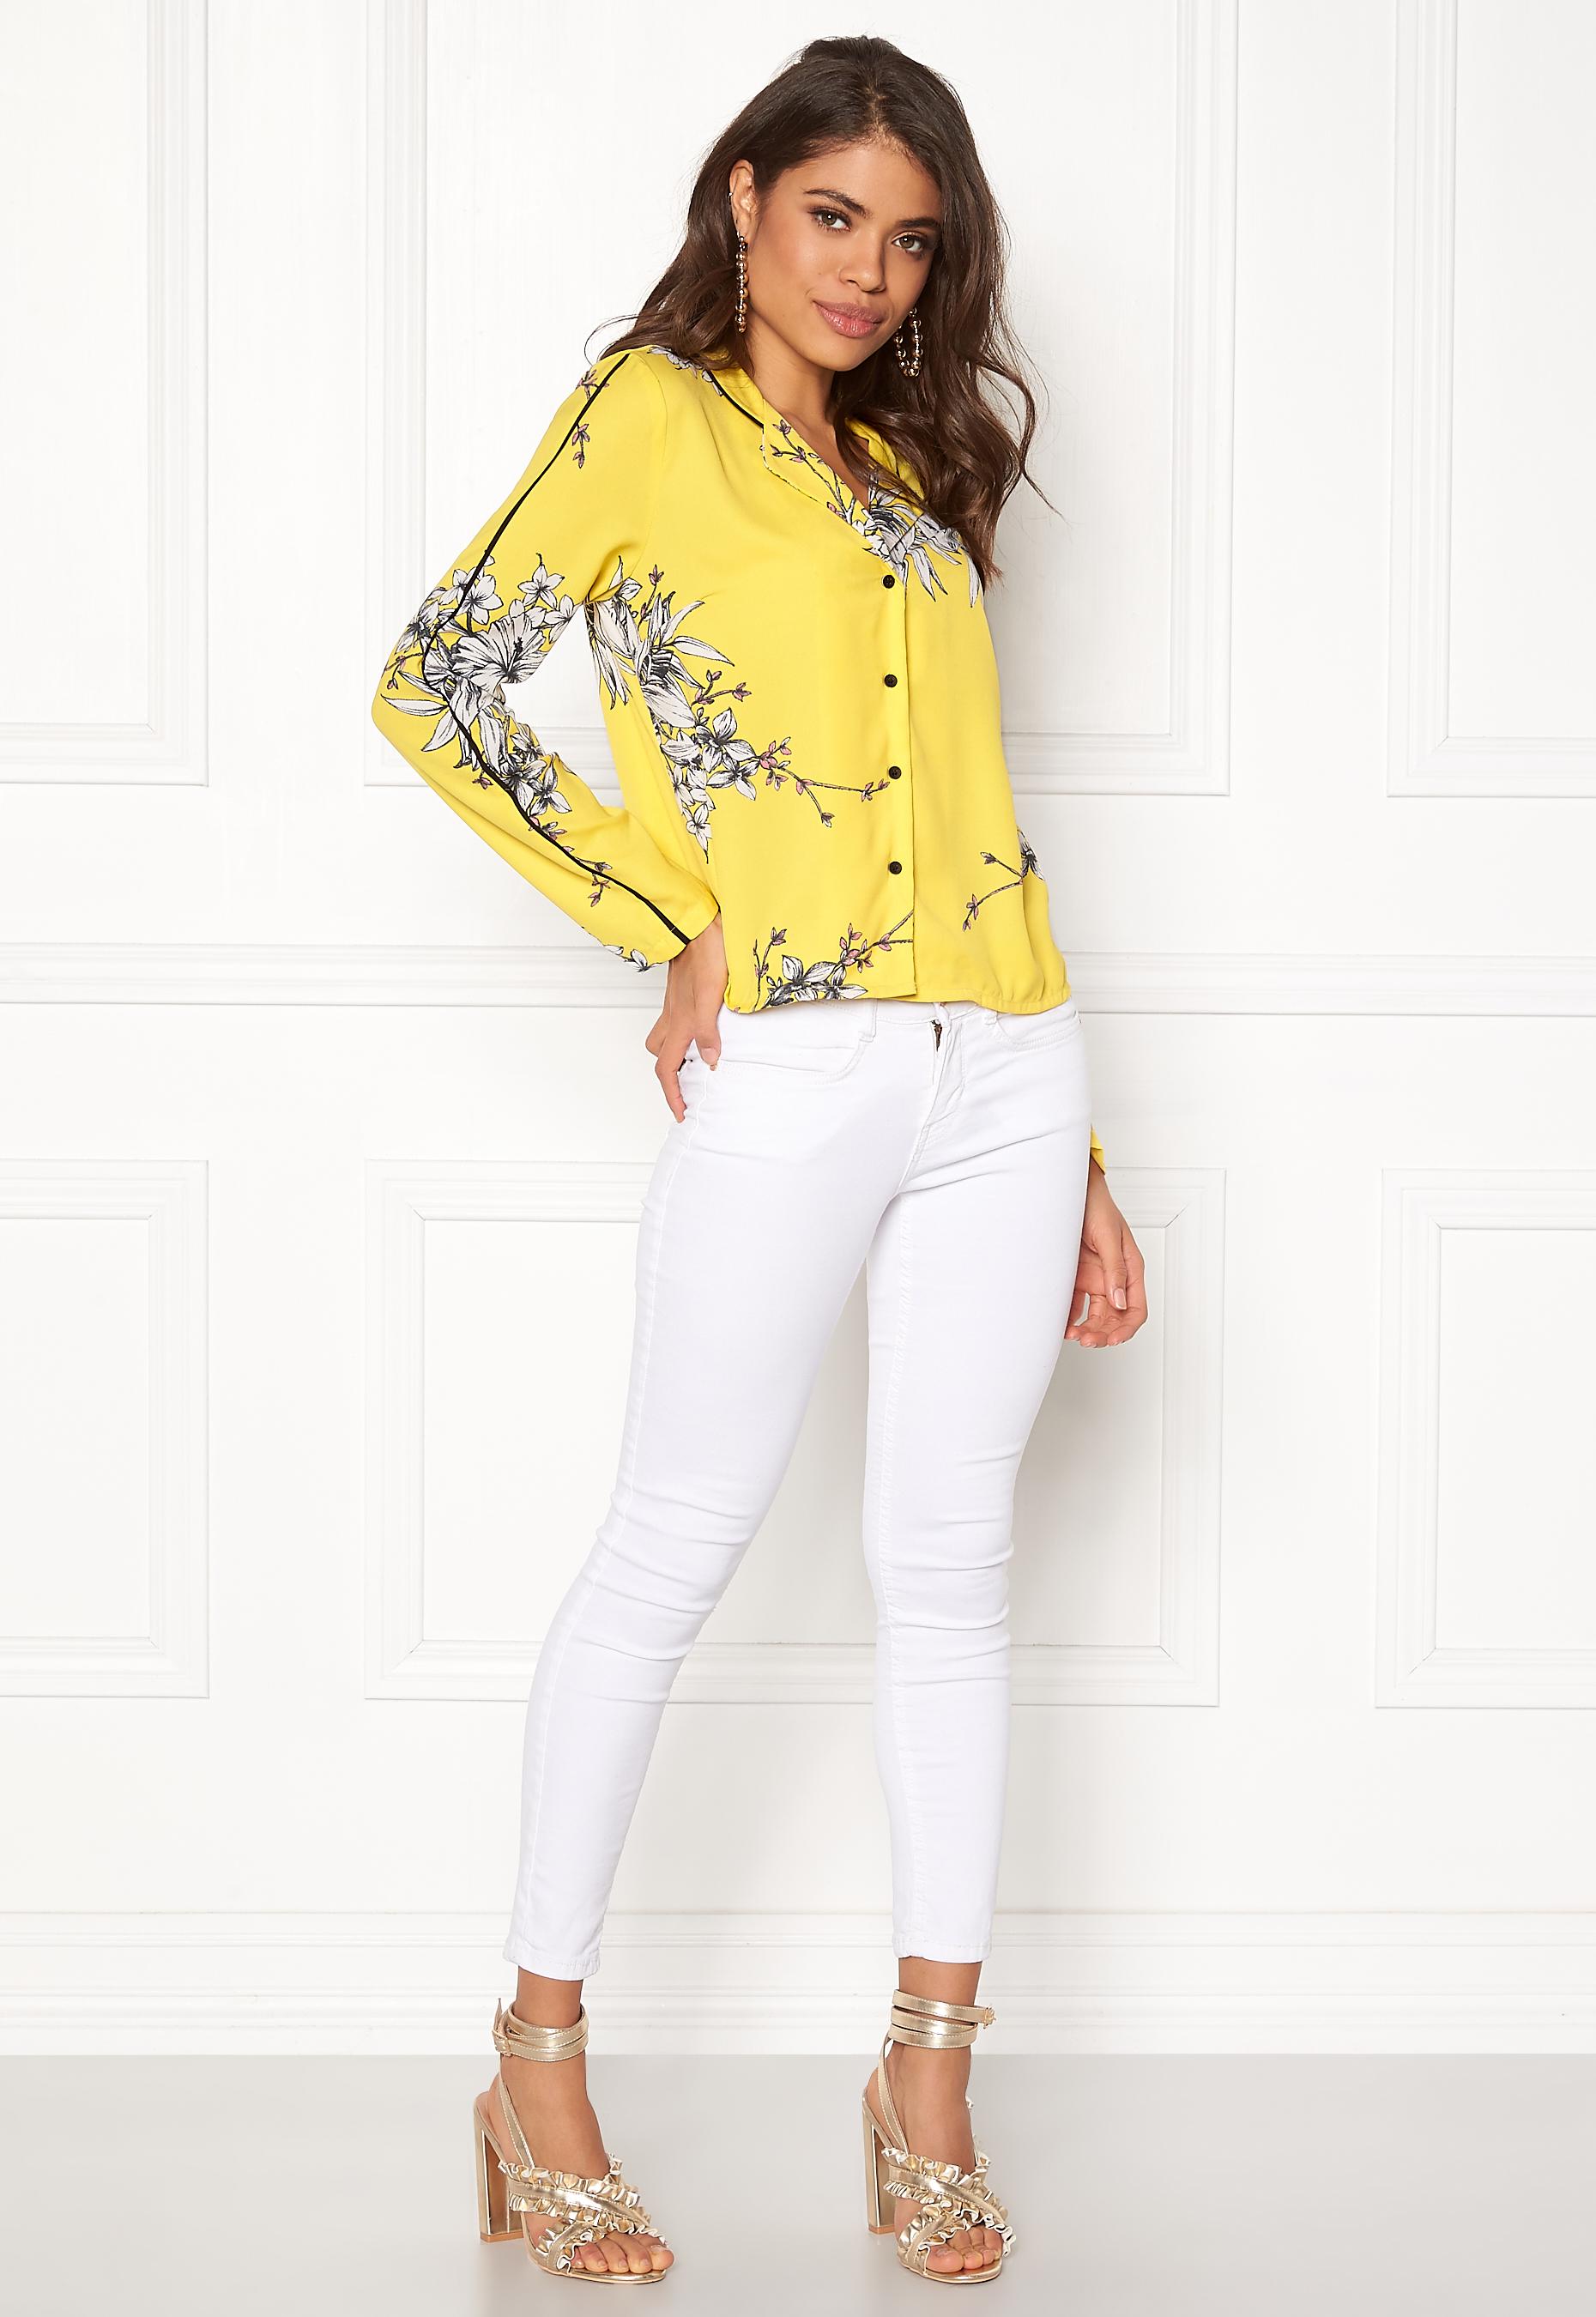 VERO MODA Satina LS Shirt Cream Gold - Bubbleroom 77784e4285